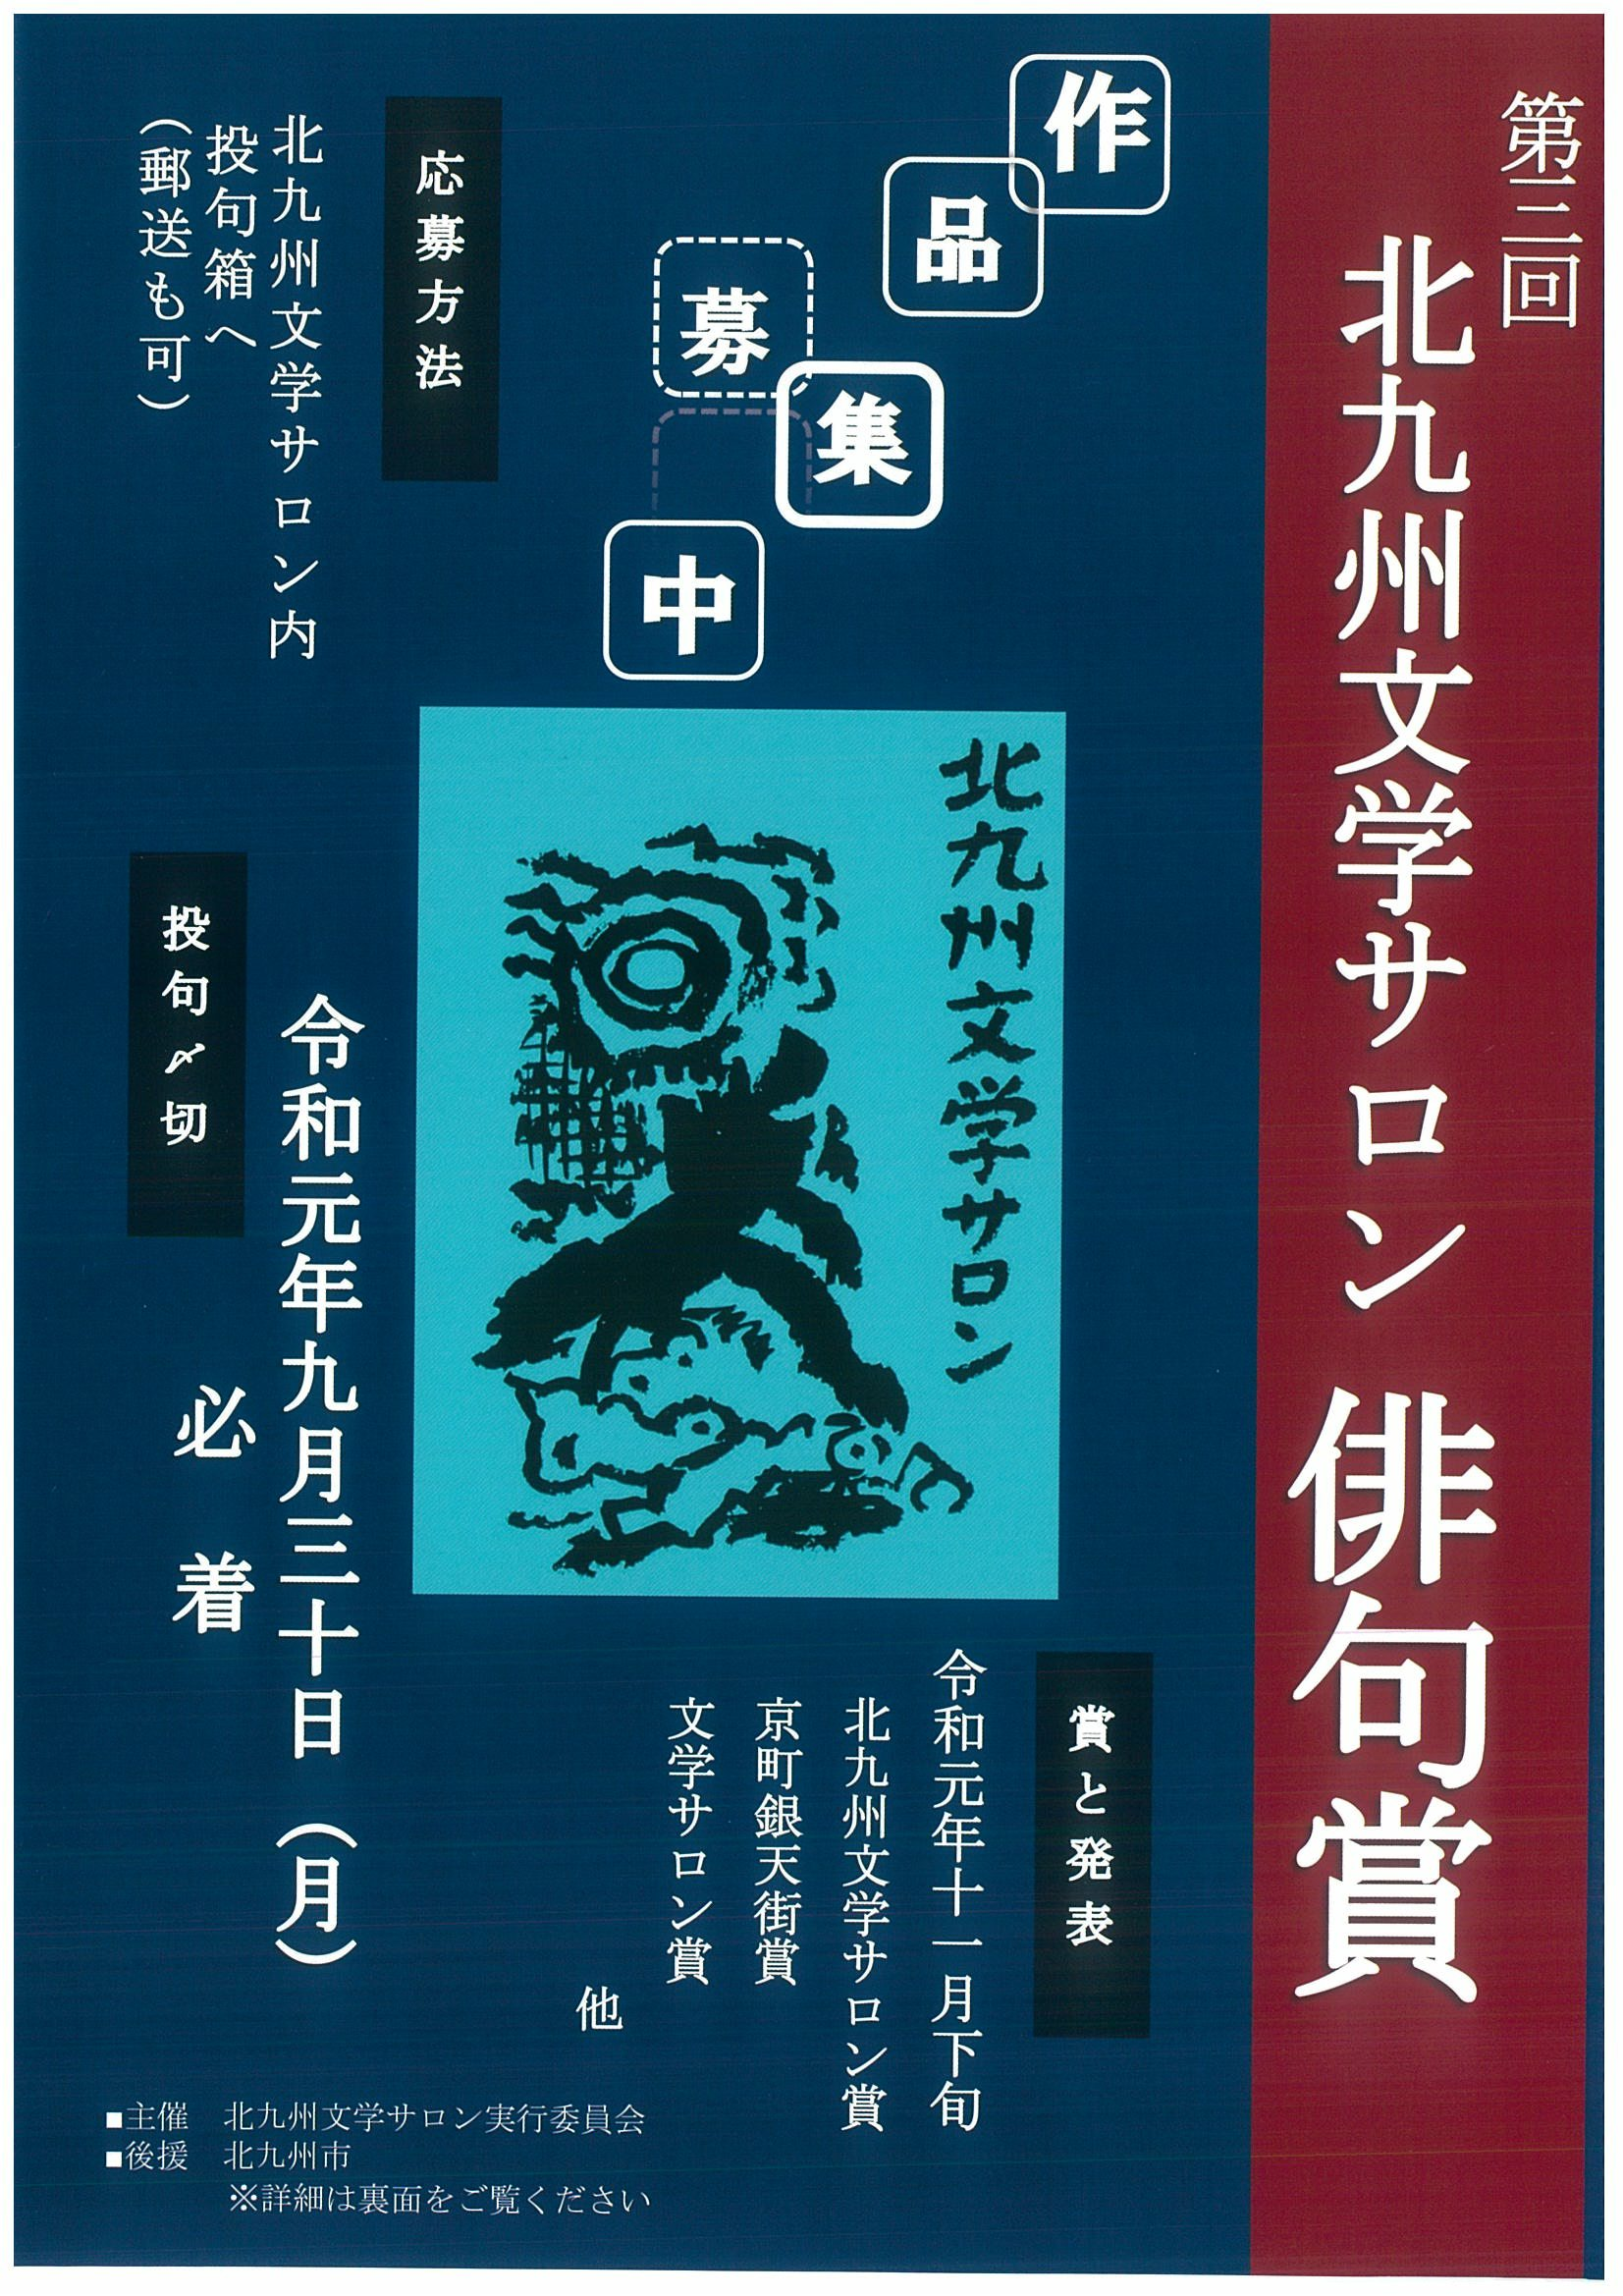 第3回北九州文学サロン俳句賞